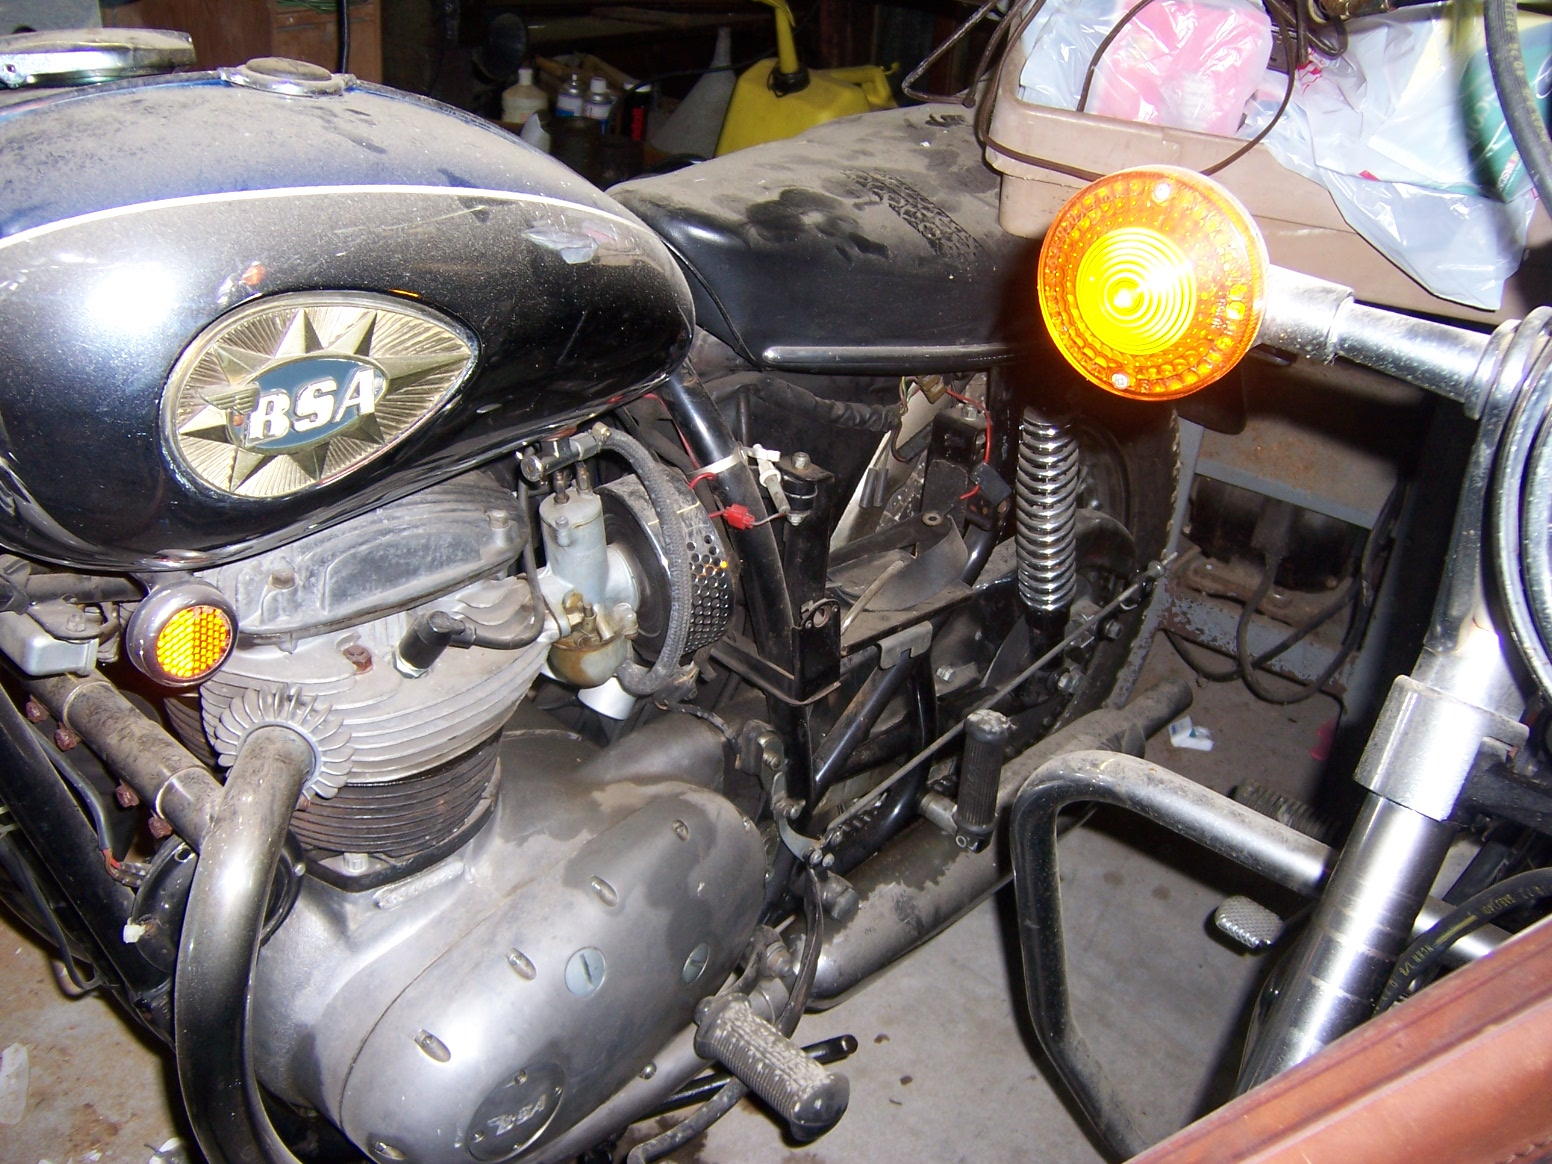 medium resolution of keeping the rockers rolling 1970 bsa lightning rh keepingtherockersrolling blogspot com suzuki atv wiring diagrams suzuki